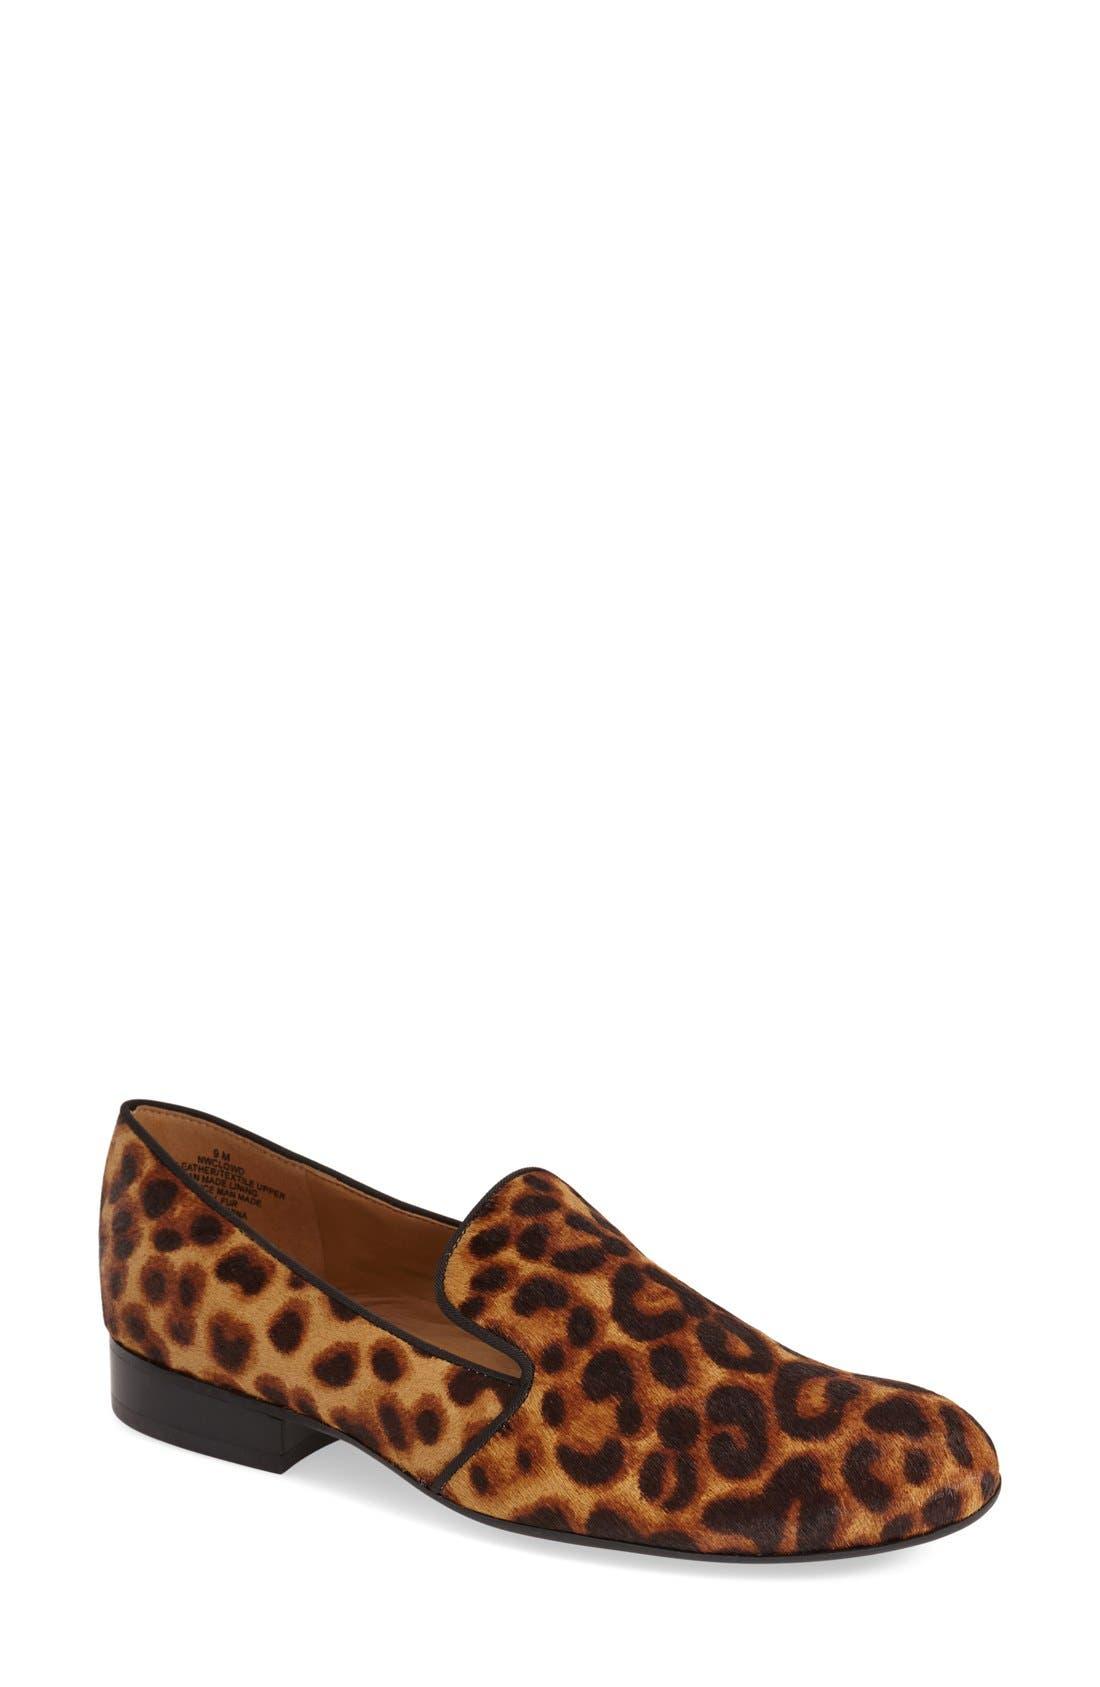 Alternate Image 1 Selected - Nine West 'Clowd'RoundToe Loafer (Women)